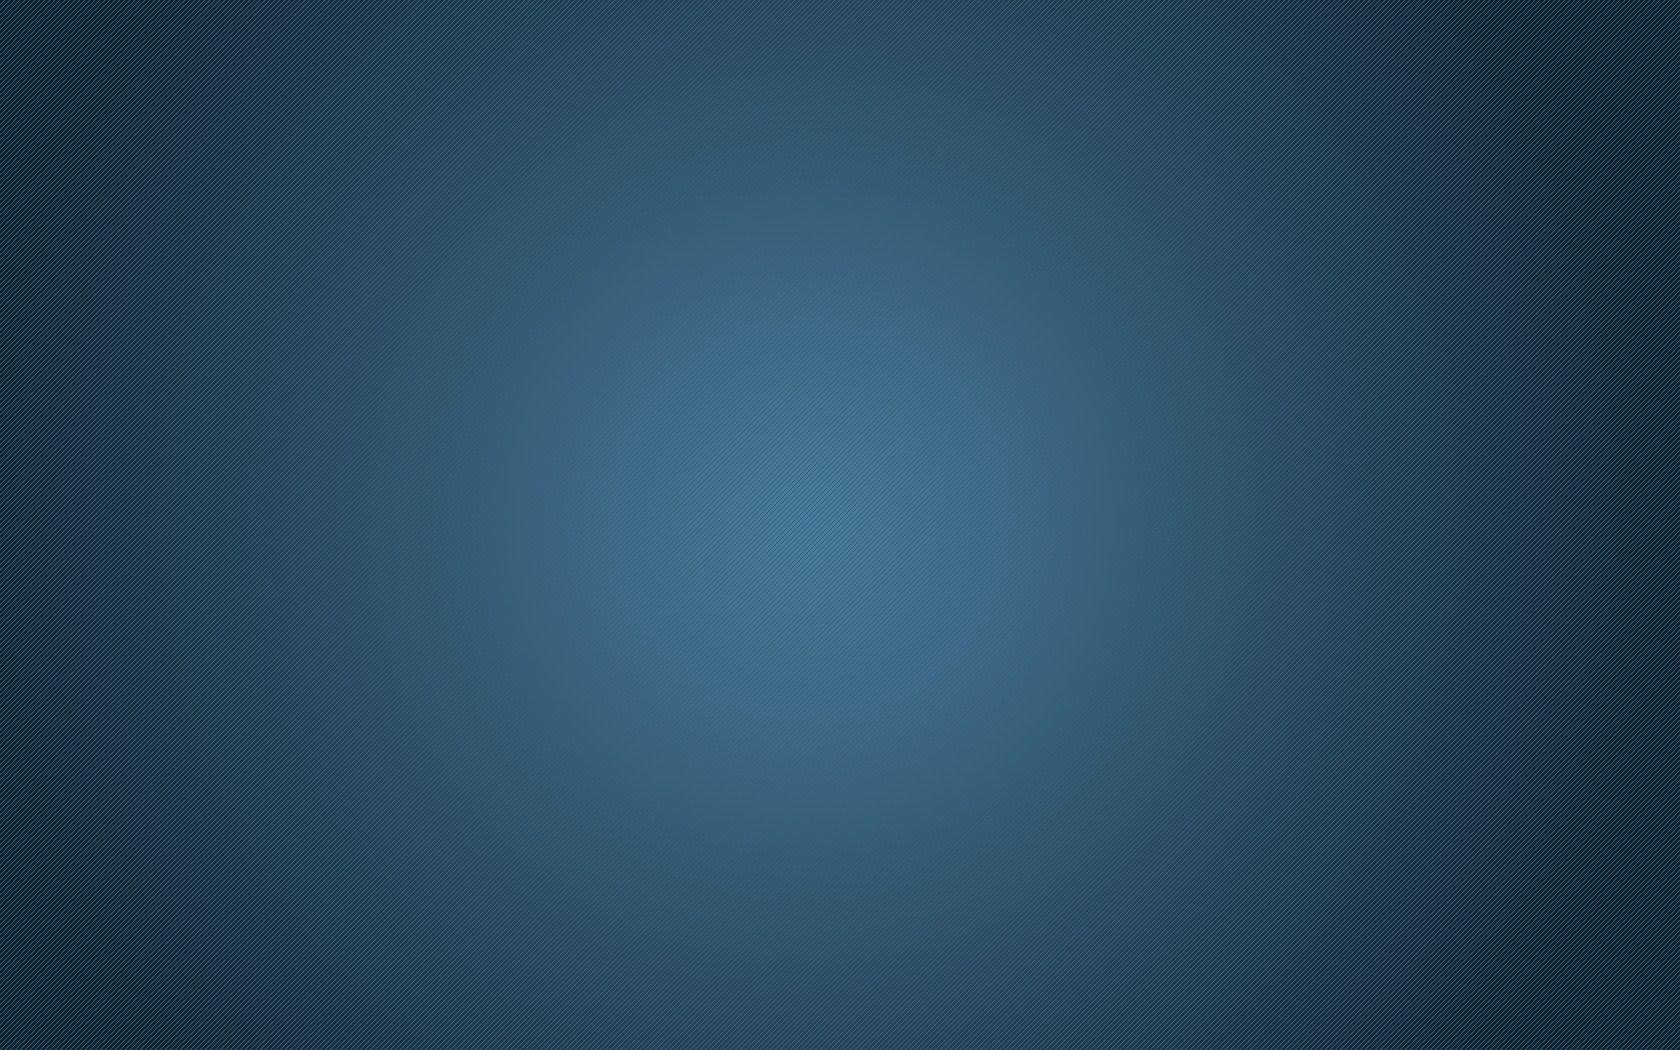 Minimalist Wallpaper Blue images 1680x1050